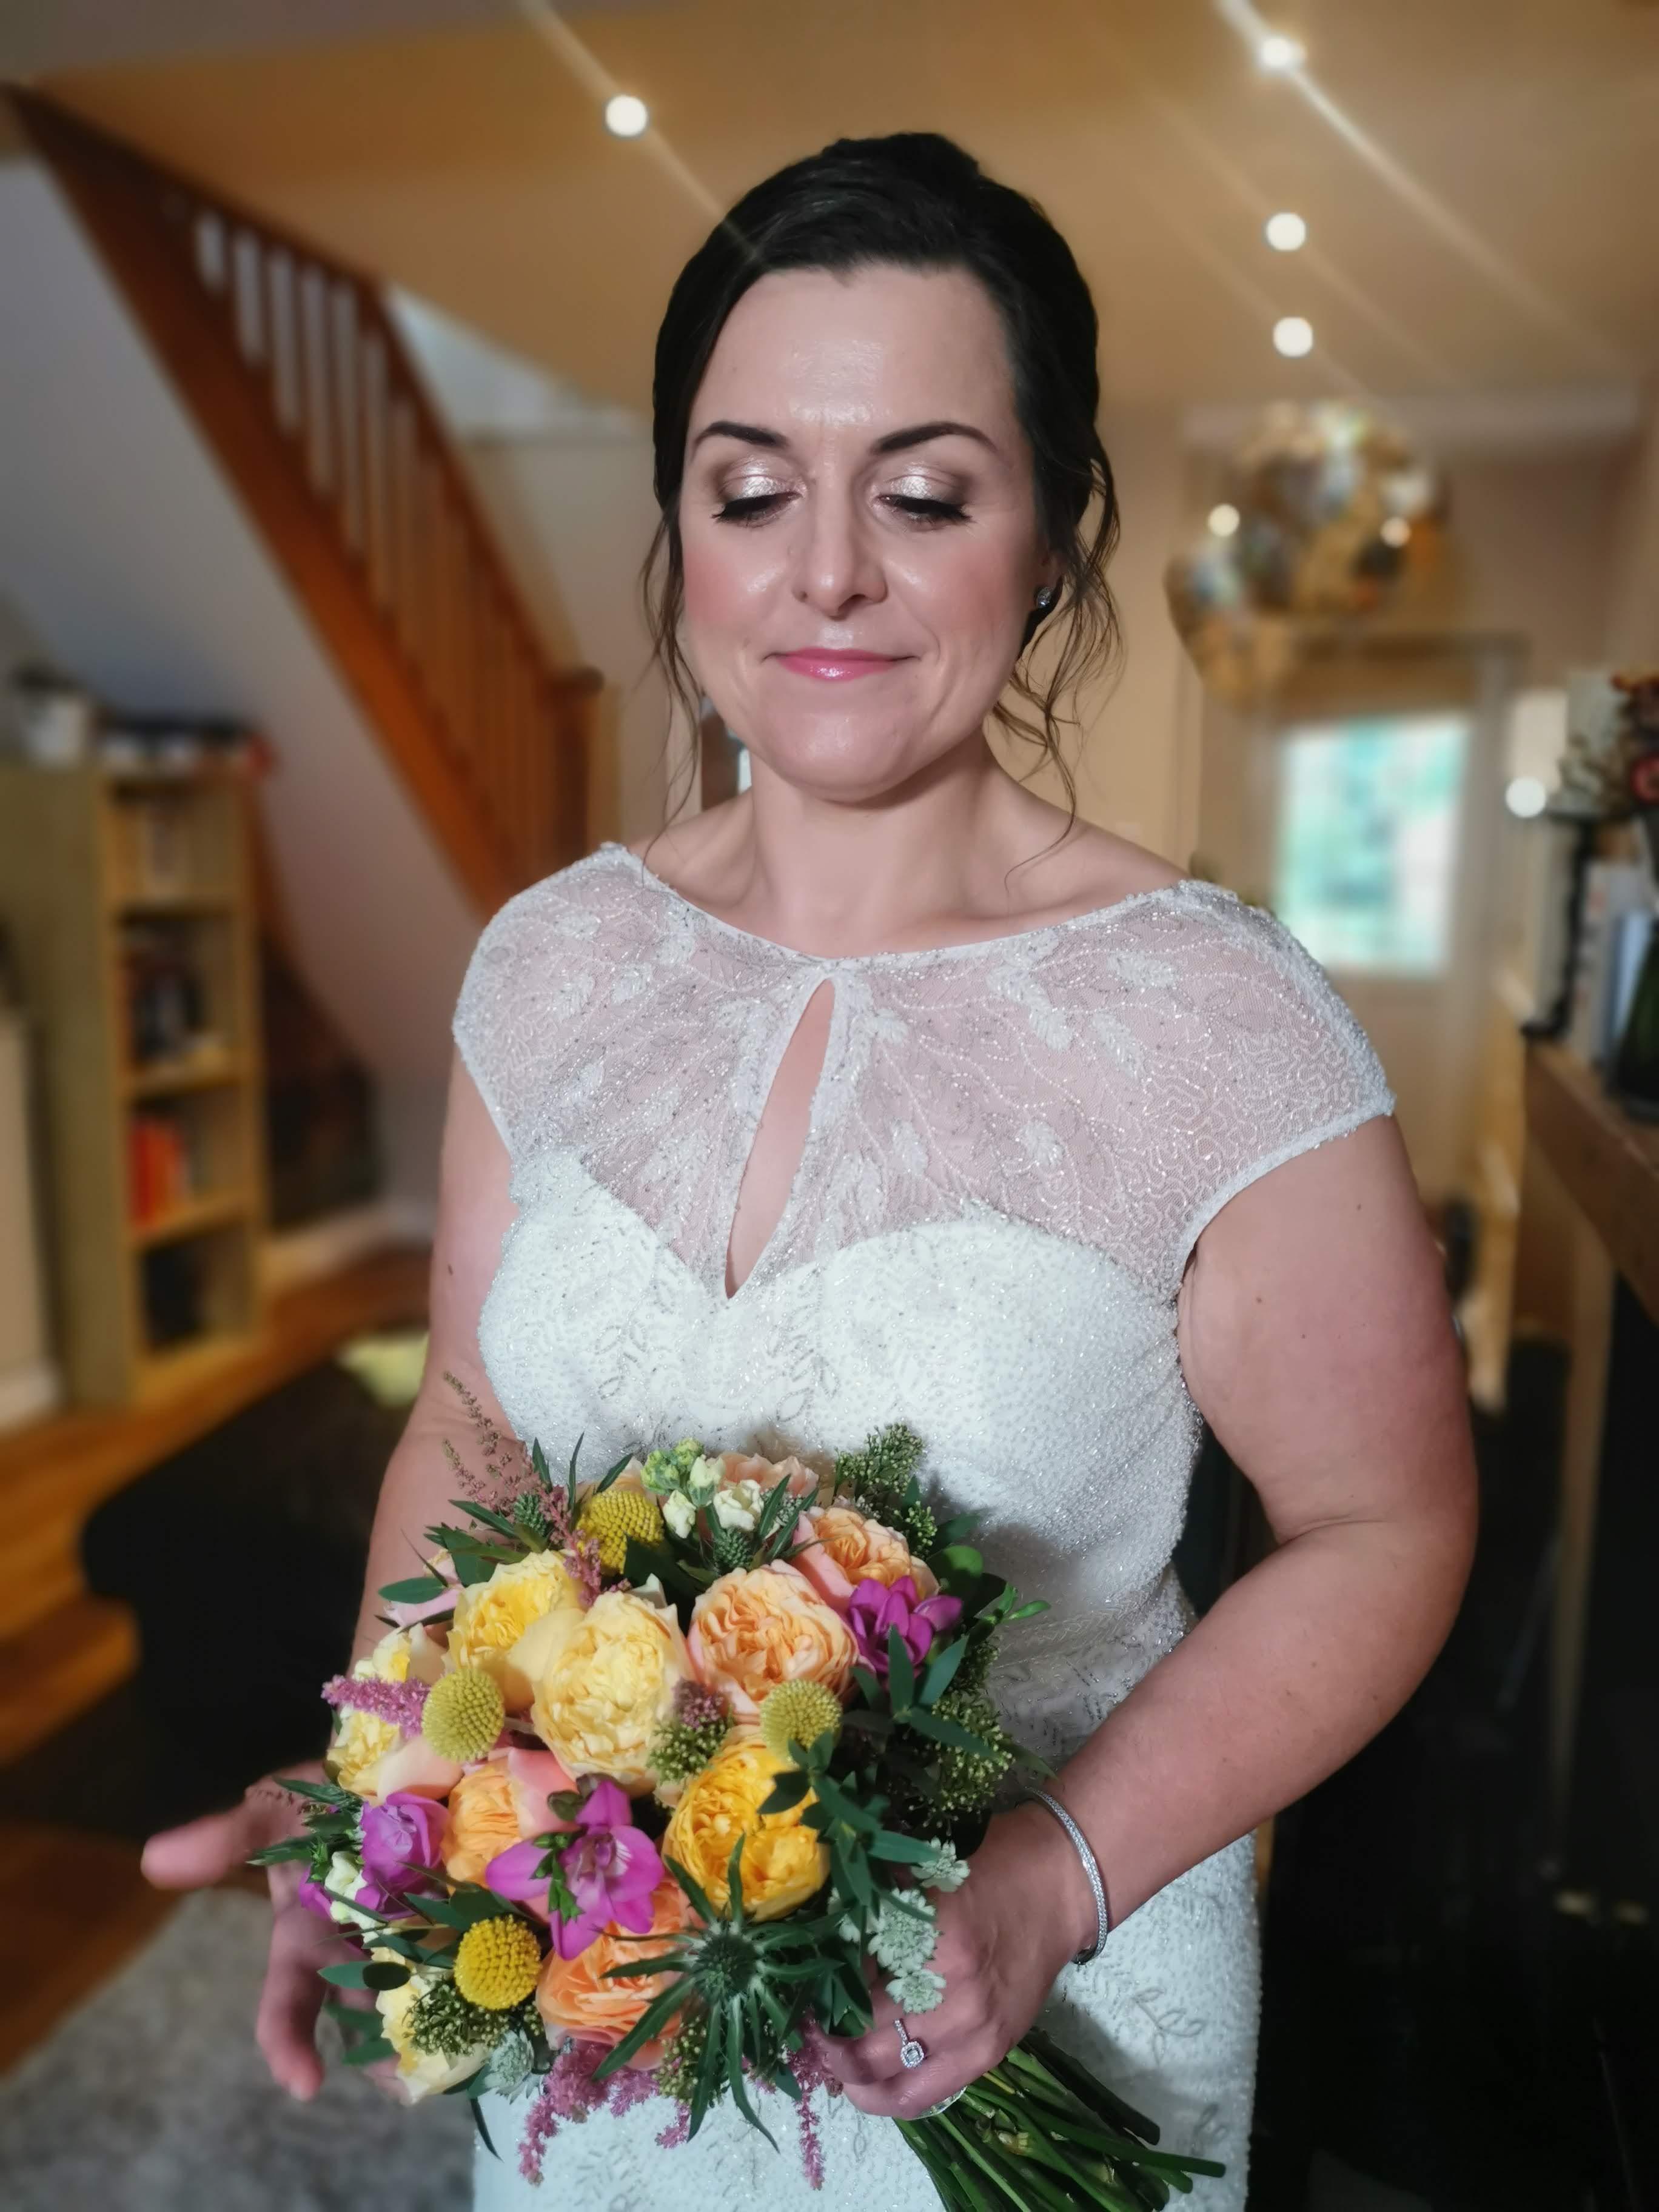 Specialist-Wedding-Makeup-Artist-Makeup-By-Mirna17